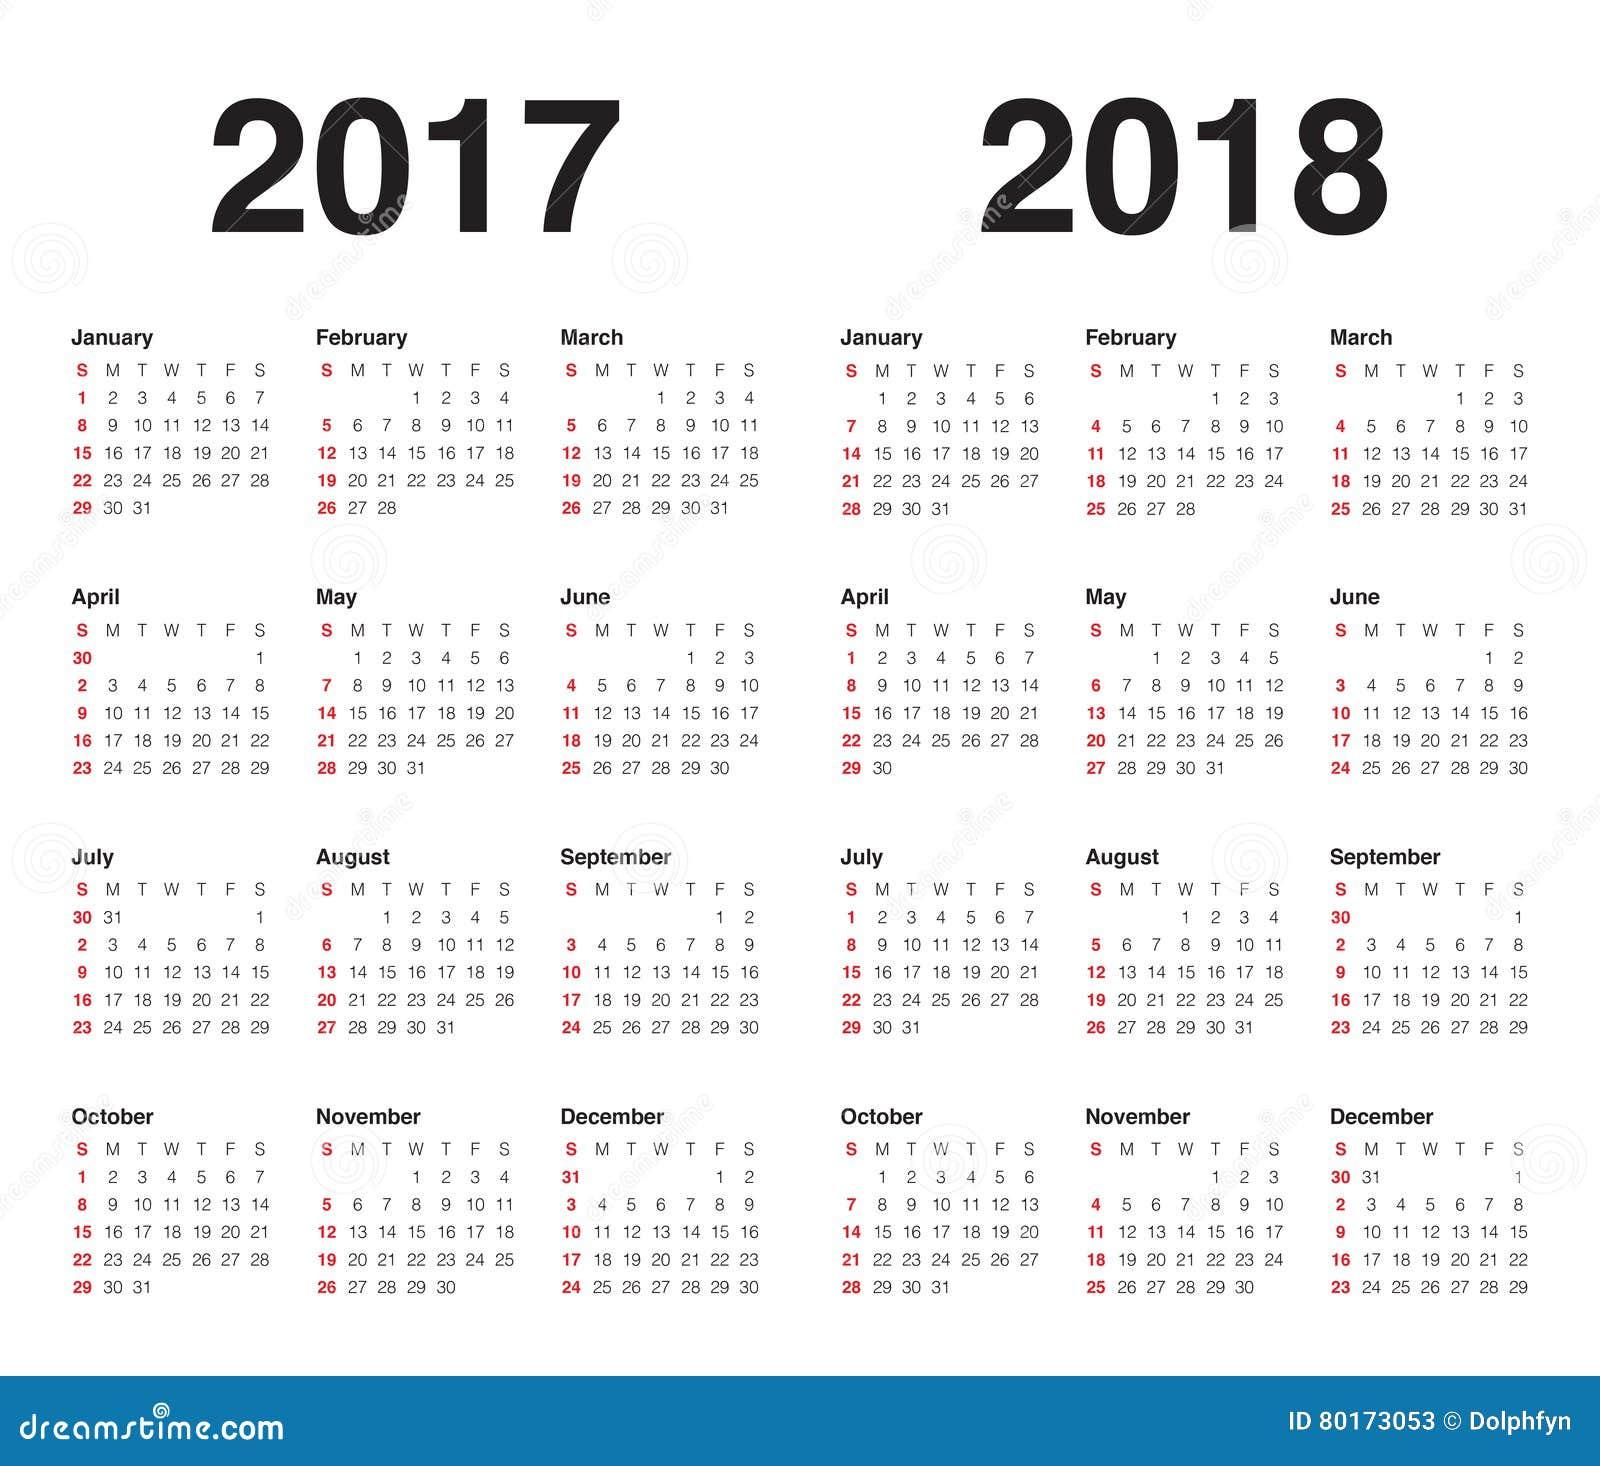 pembrokeshire school holidays 2017-18 pdf